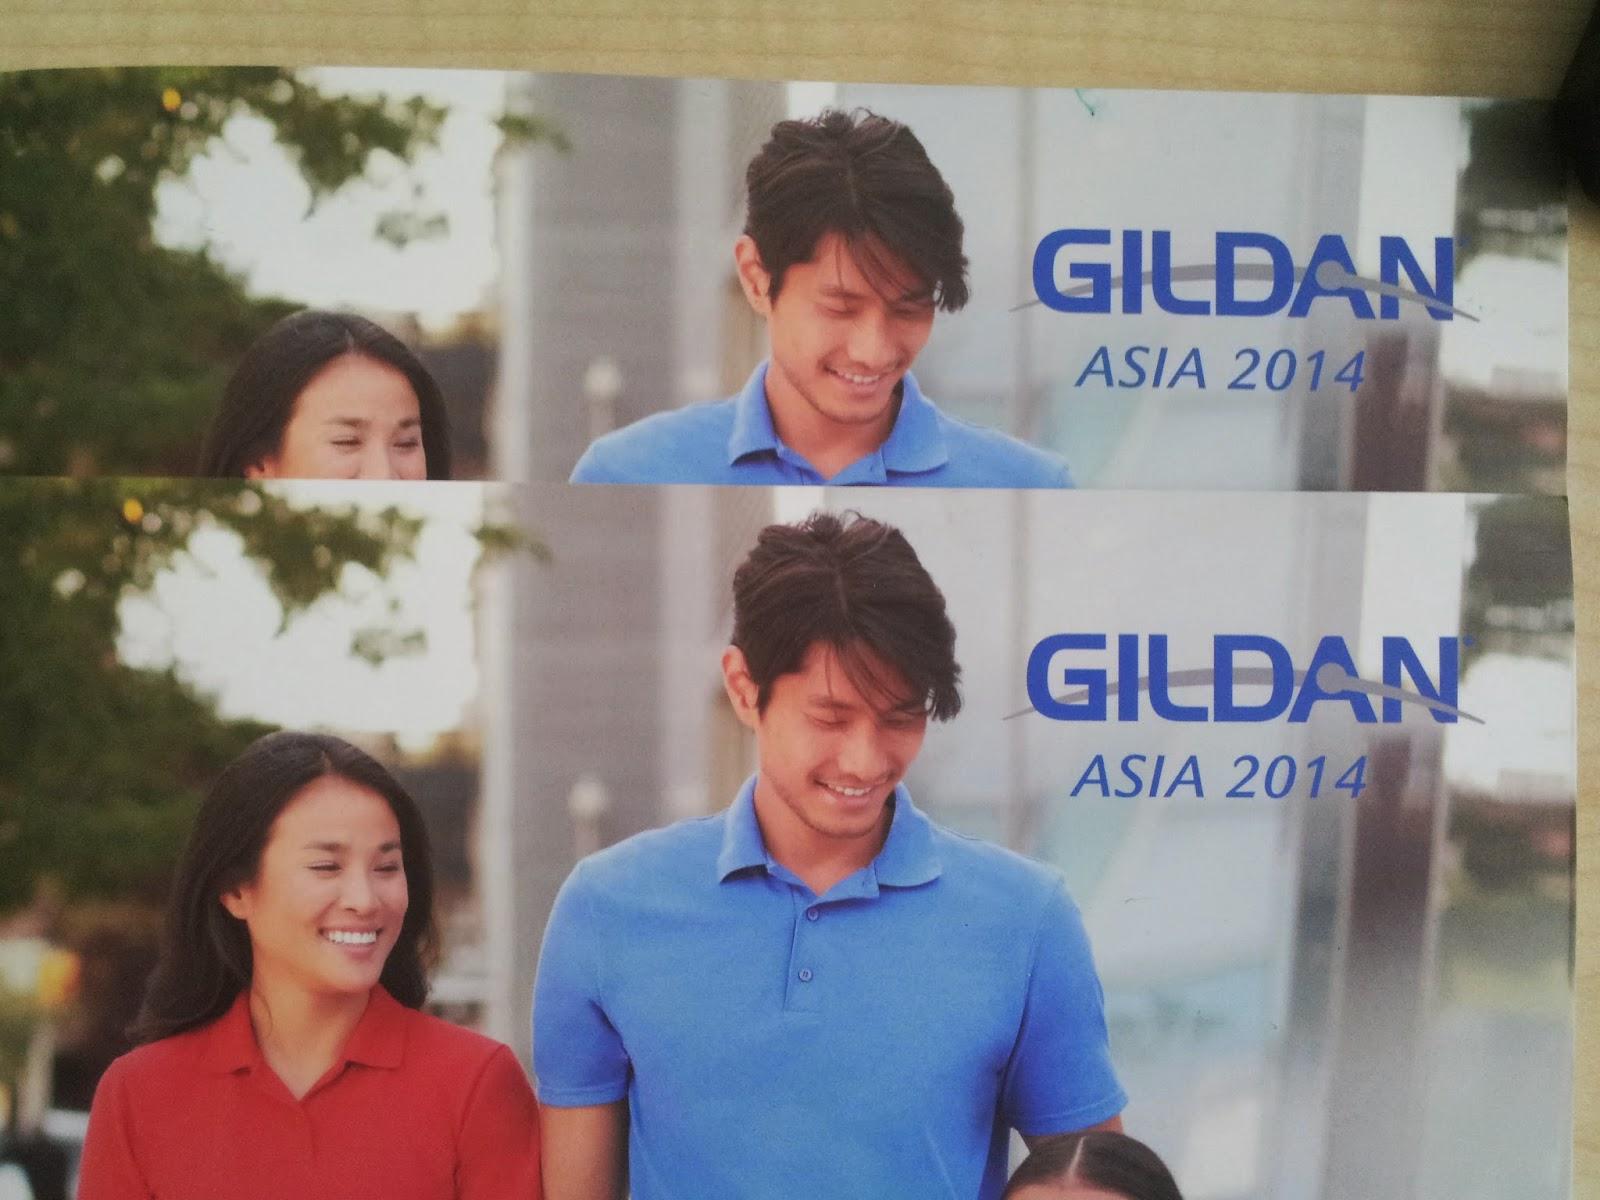 Gildan banner 2014